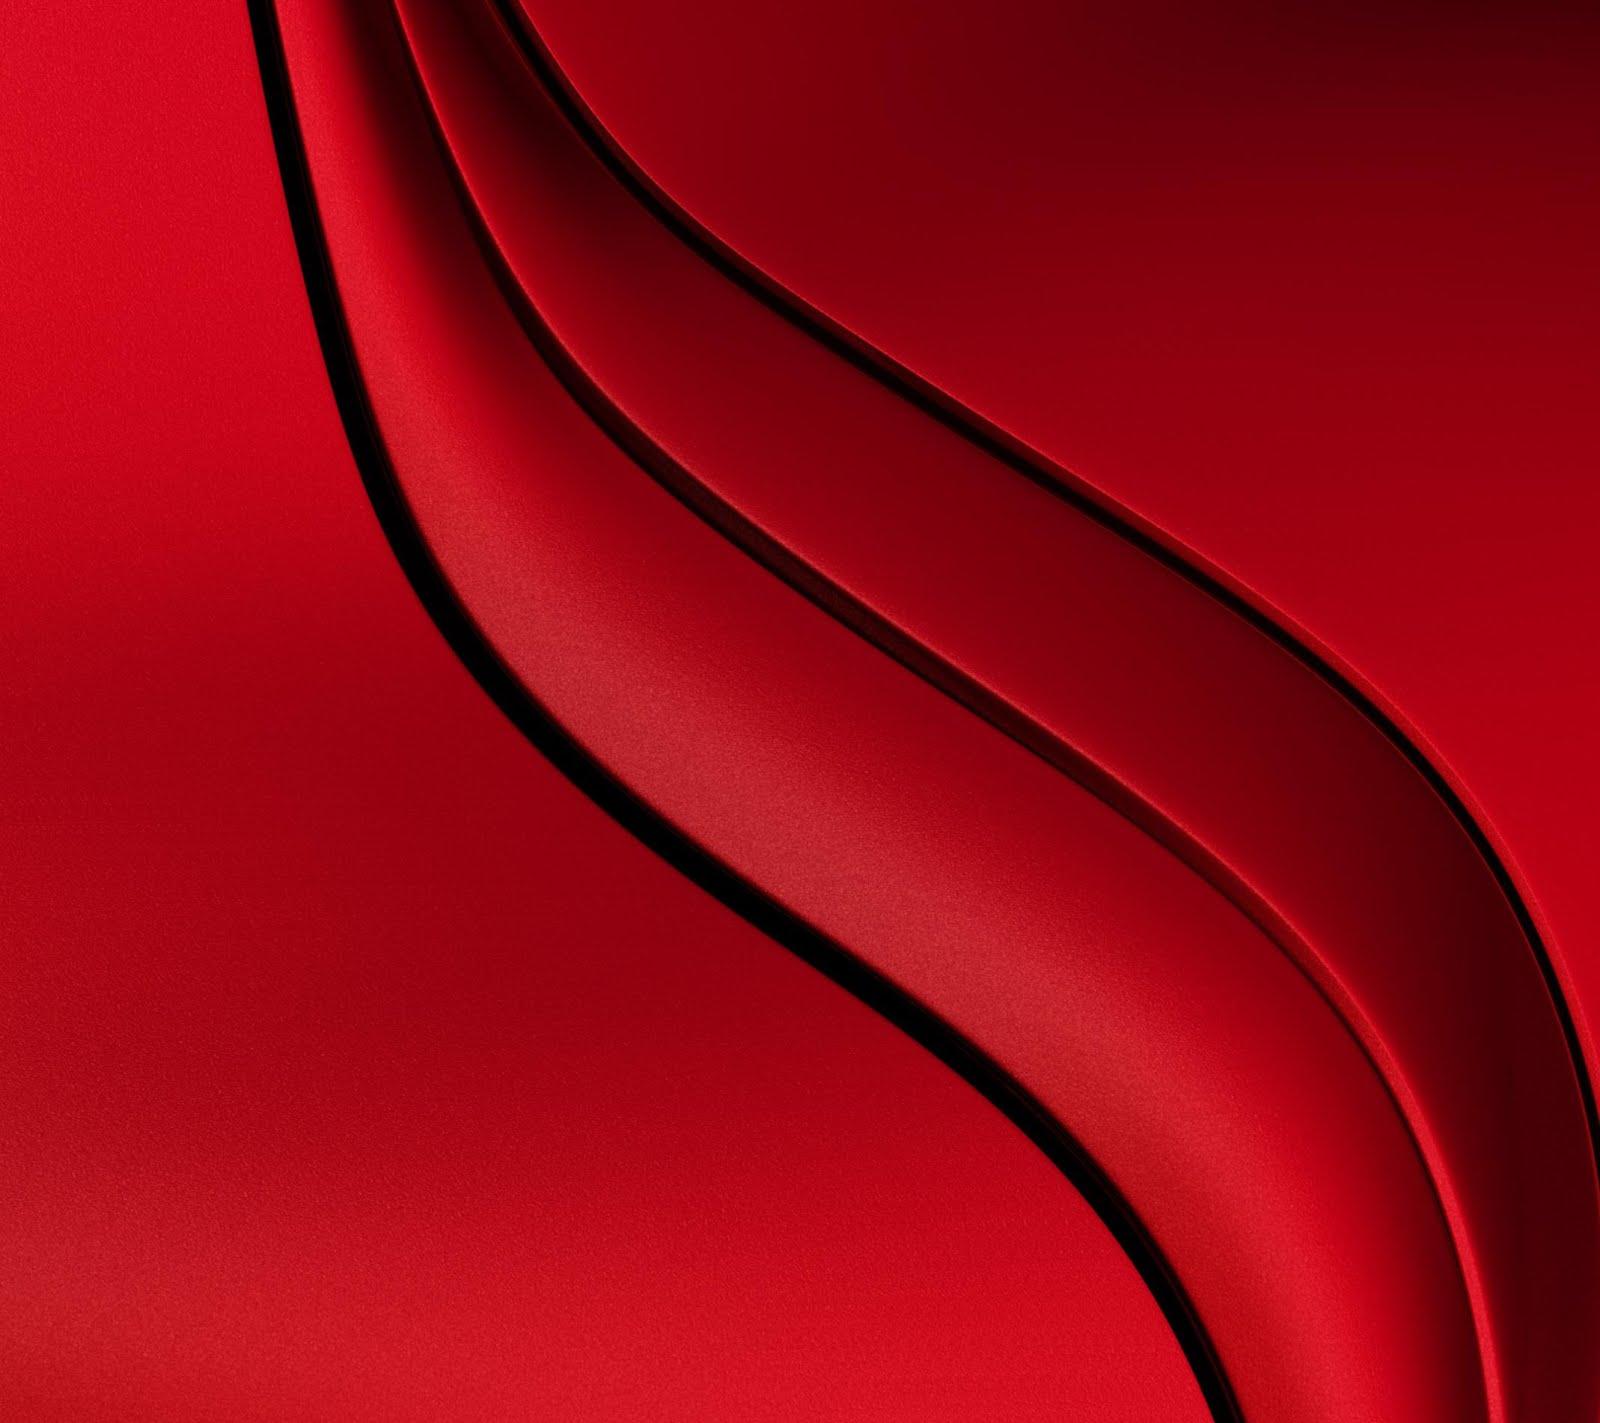 http://3.bp.blogspot.com/-ecxfh3E2TCc/UN2V6fQeA7I/AAAAAAAAVc4/XeHLW9rKgA8/s1600/kddi_wallpaper_red.jpg